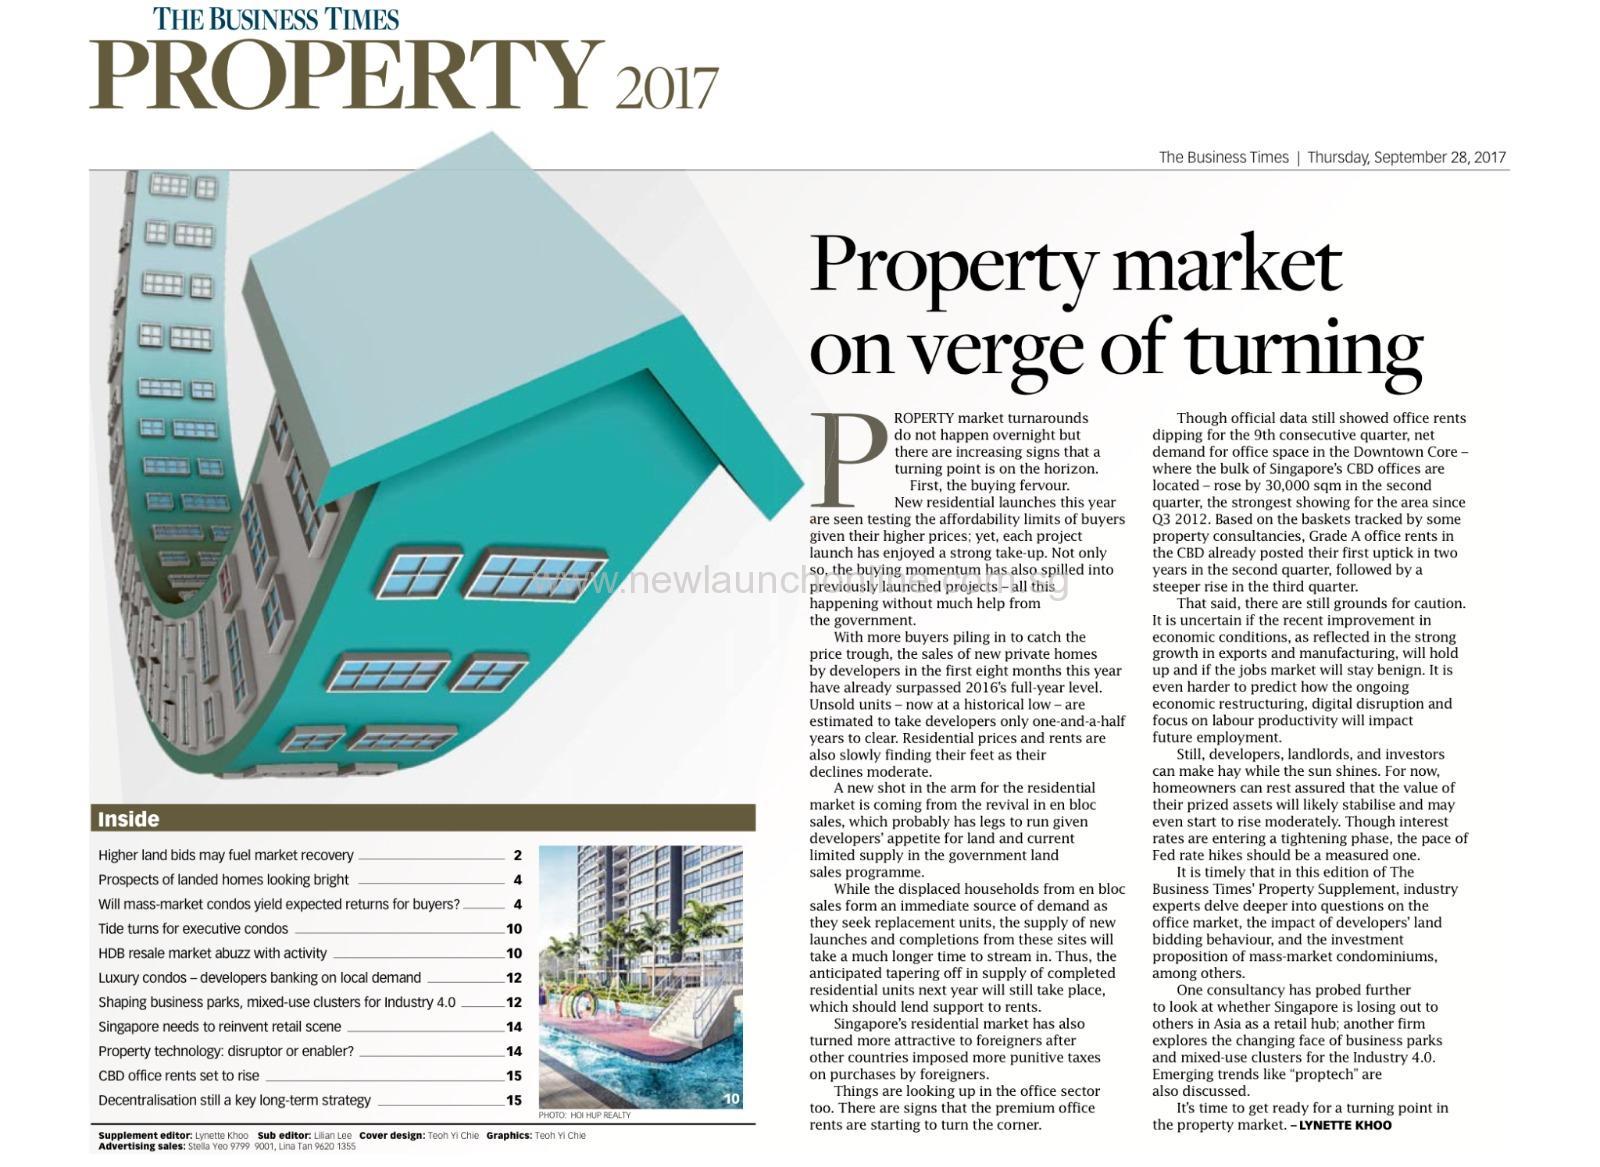 is market on the verge of upturn